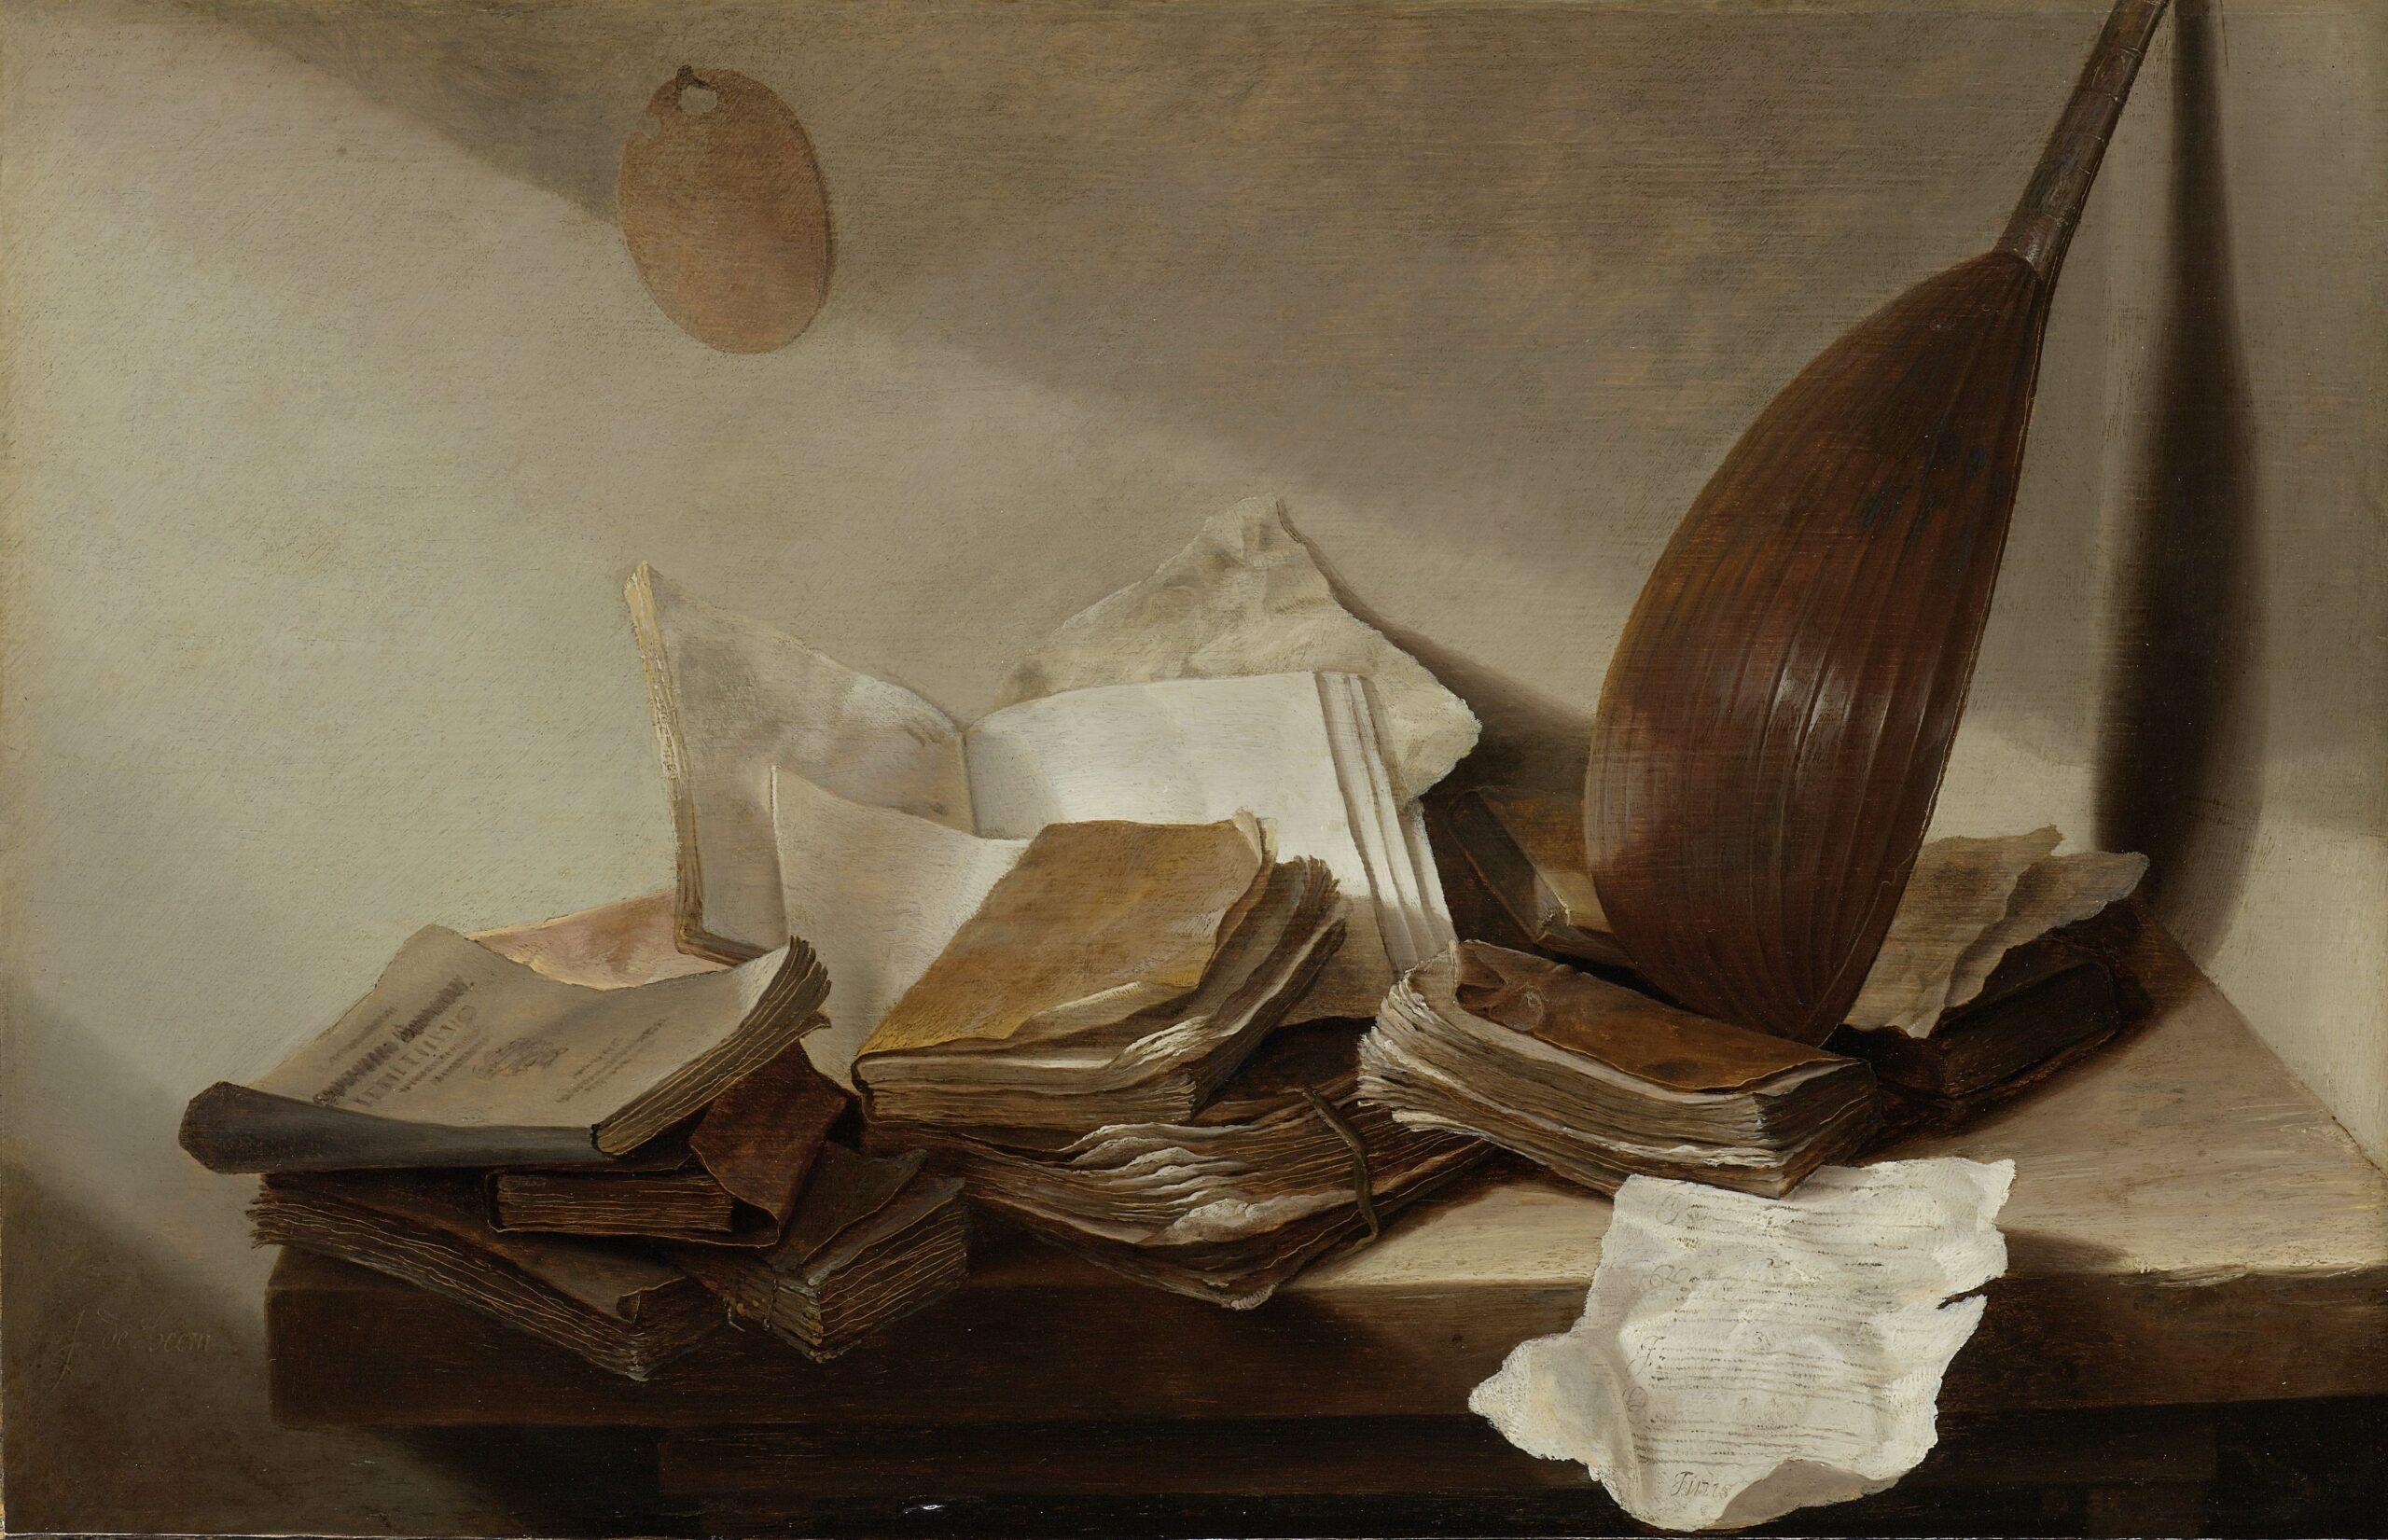 Jan Davidsz. de Heem (1606-1683/1684), Still Life with Books, 1625 - 1630 Rijksmuseum, Amsterdam